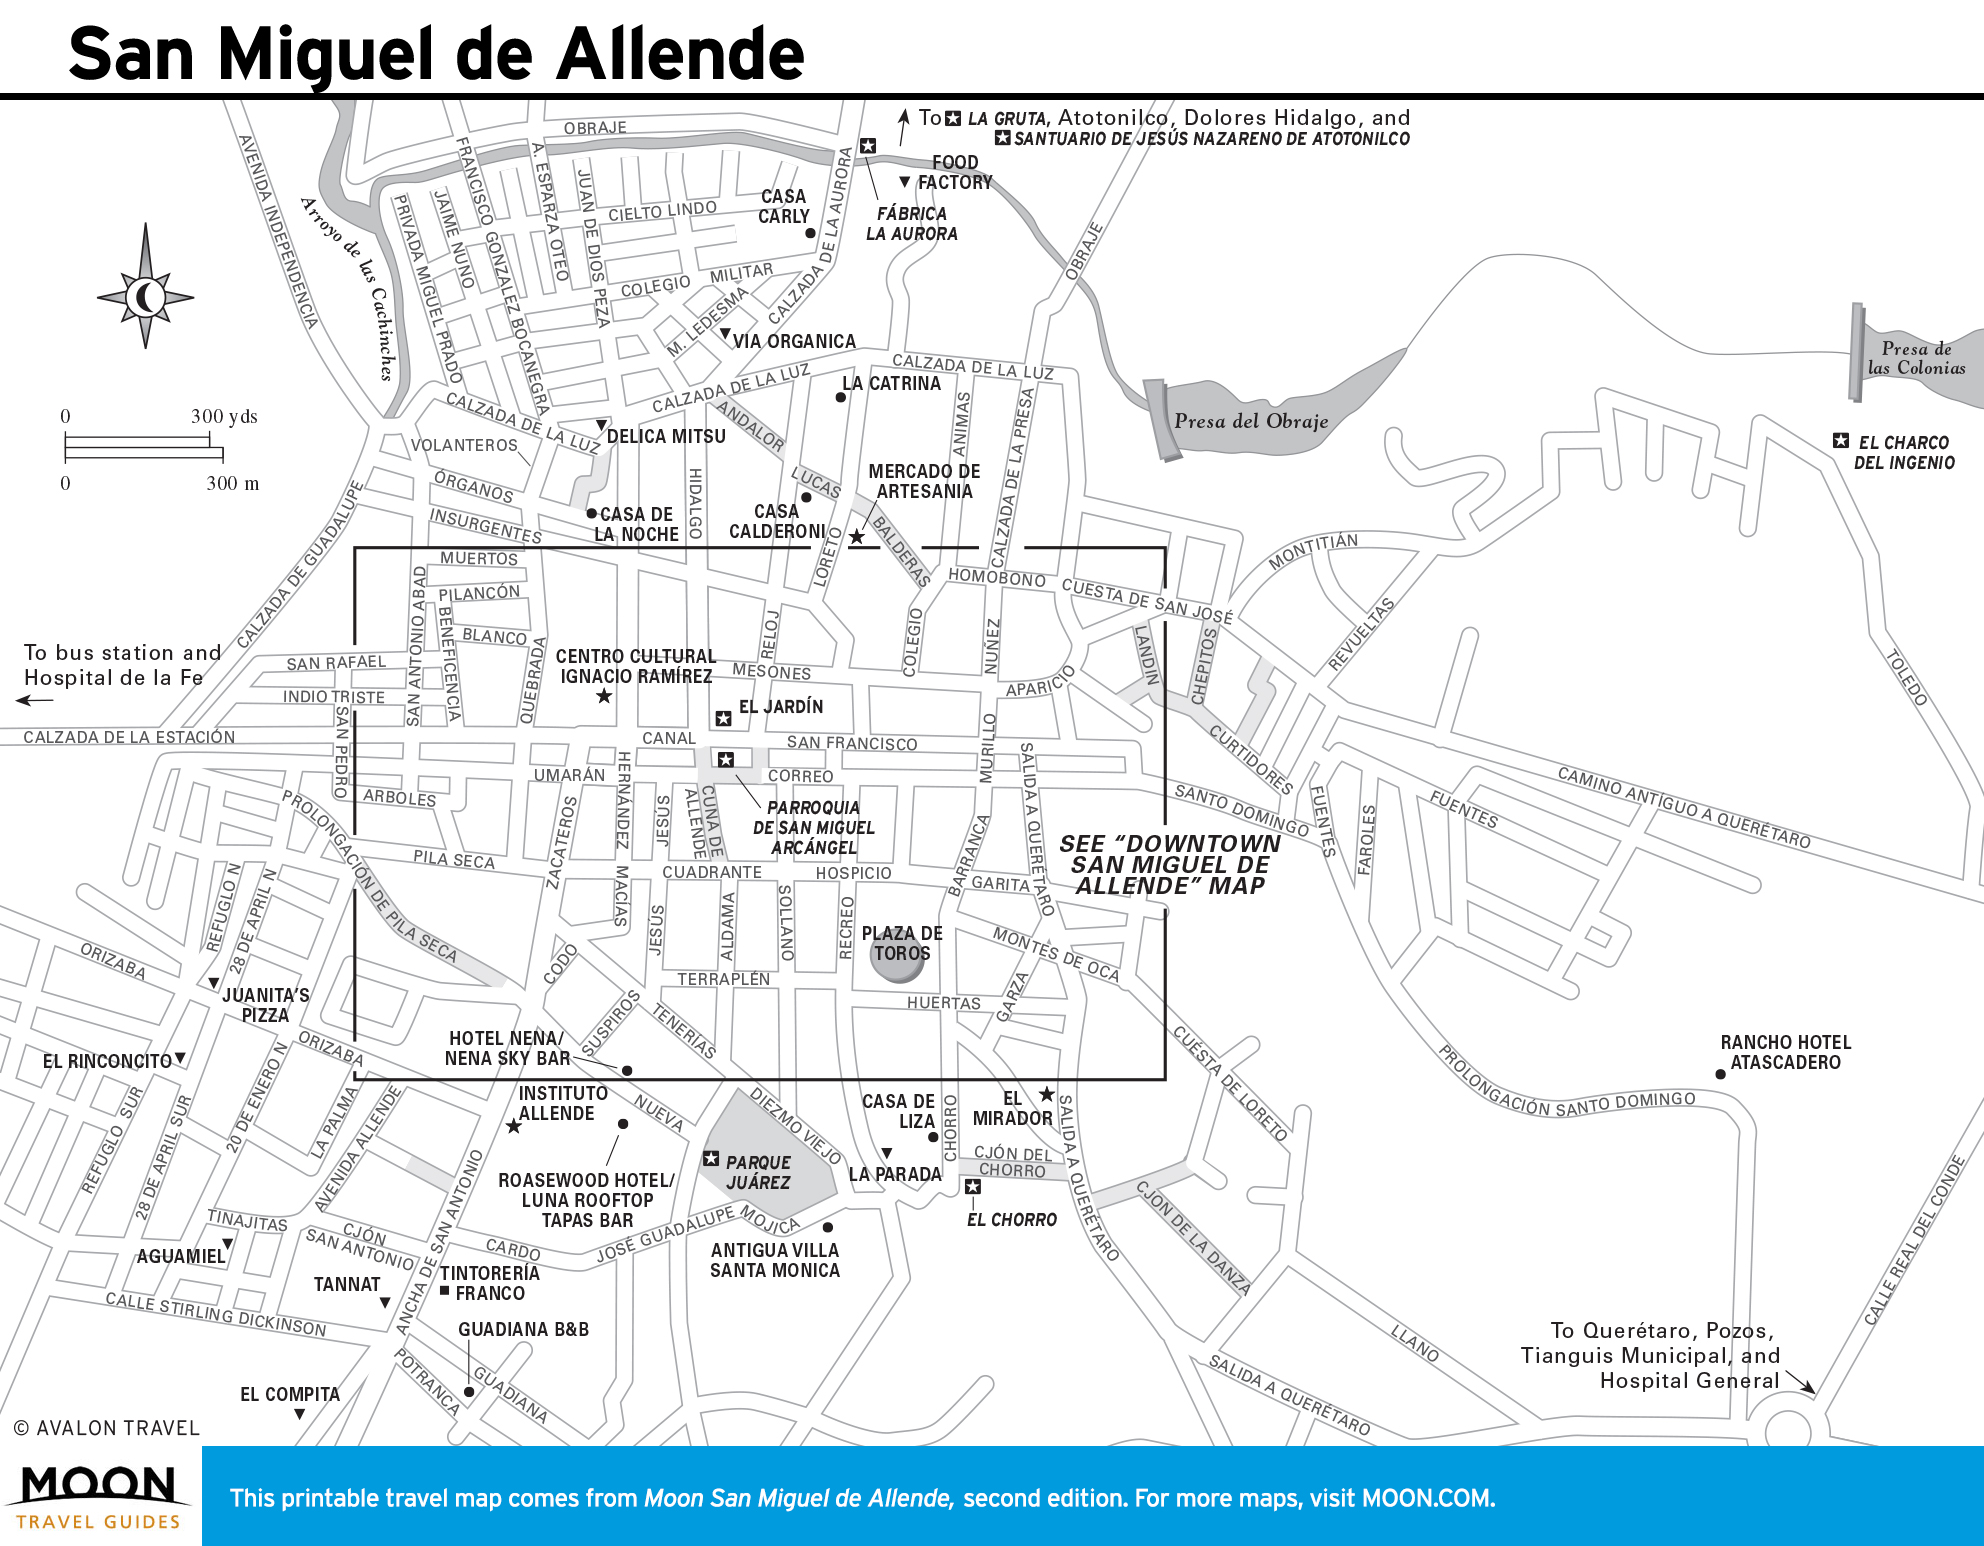 San Miguel de Allende | Avalon Travel on hermosillo map, san miguel county nm map, ixtapan de la sal map, mexico map, morelia map, isla mujeres map, antigua guatemala map, puebla on map, rio de janeiro map, latin america map, san cristobal de las casas map, ixtapa zihuatanejo map, segovia spain on a map, cozumel map, real de catorce map, buenos aires map, puerto vallarta map, rincon de guayabitos map, chichen itza map, queretaro map,